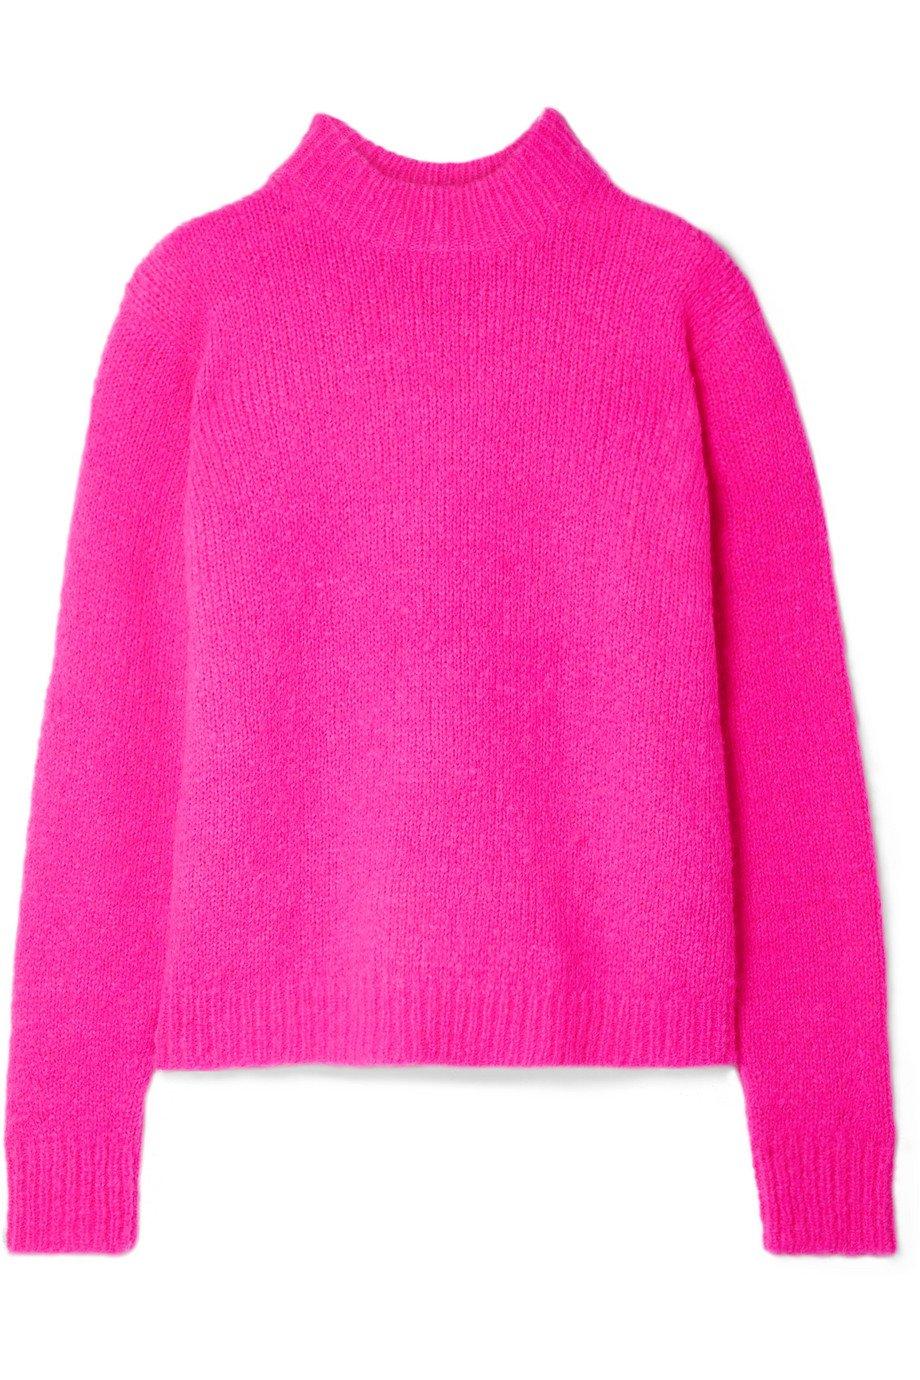 Tibi | Cozette neon alpaca-blend sweater | NET-A-PORTER.COM